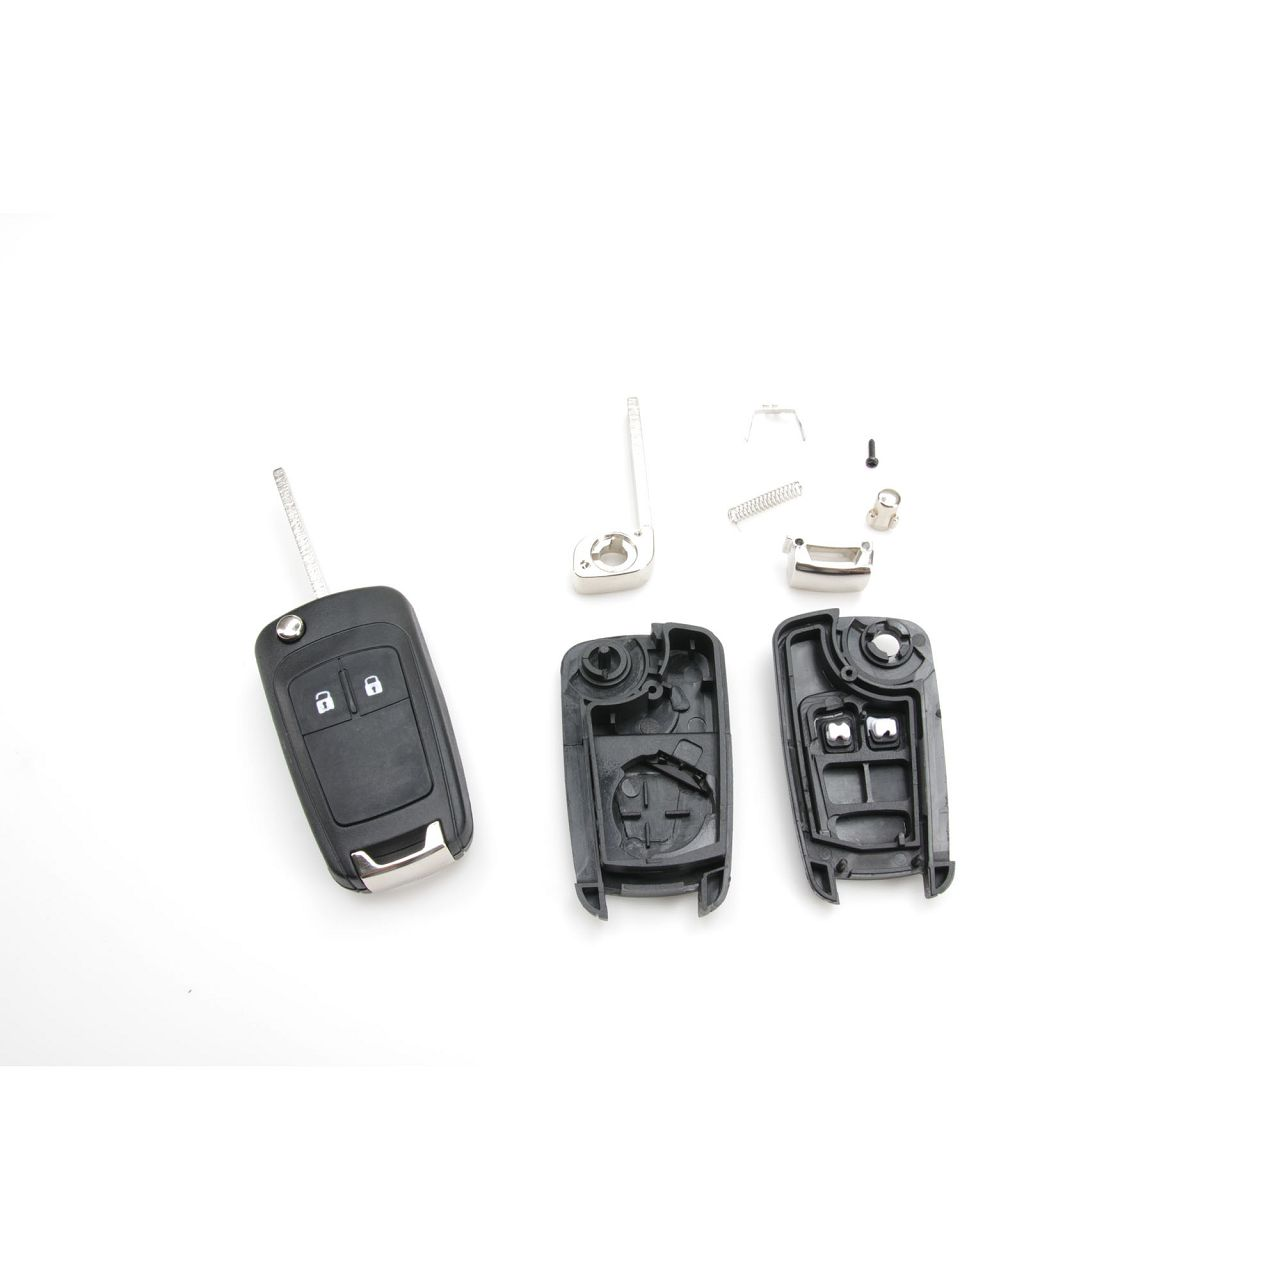 1x Schlüsselgehäuse + Schlüsselrohling 2-Tasten OPEL Astra J Insignia A